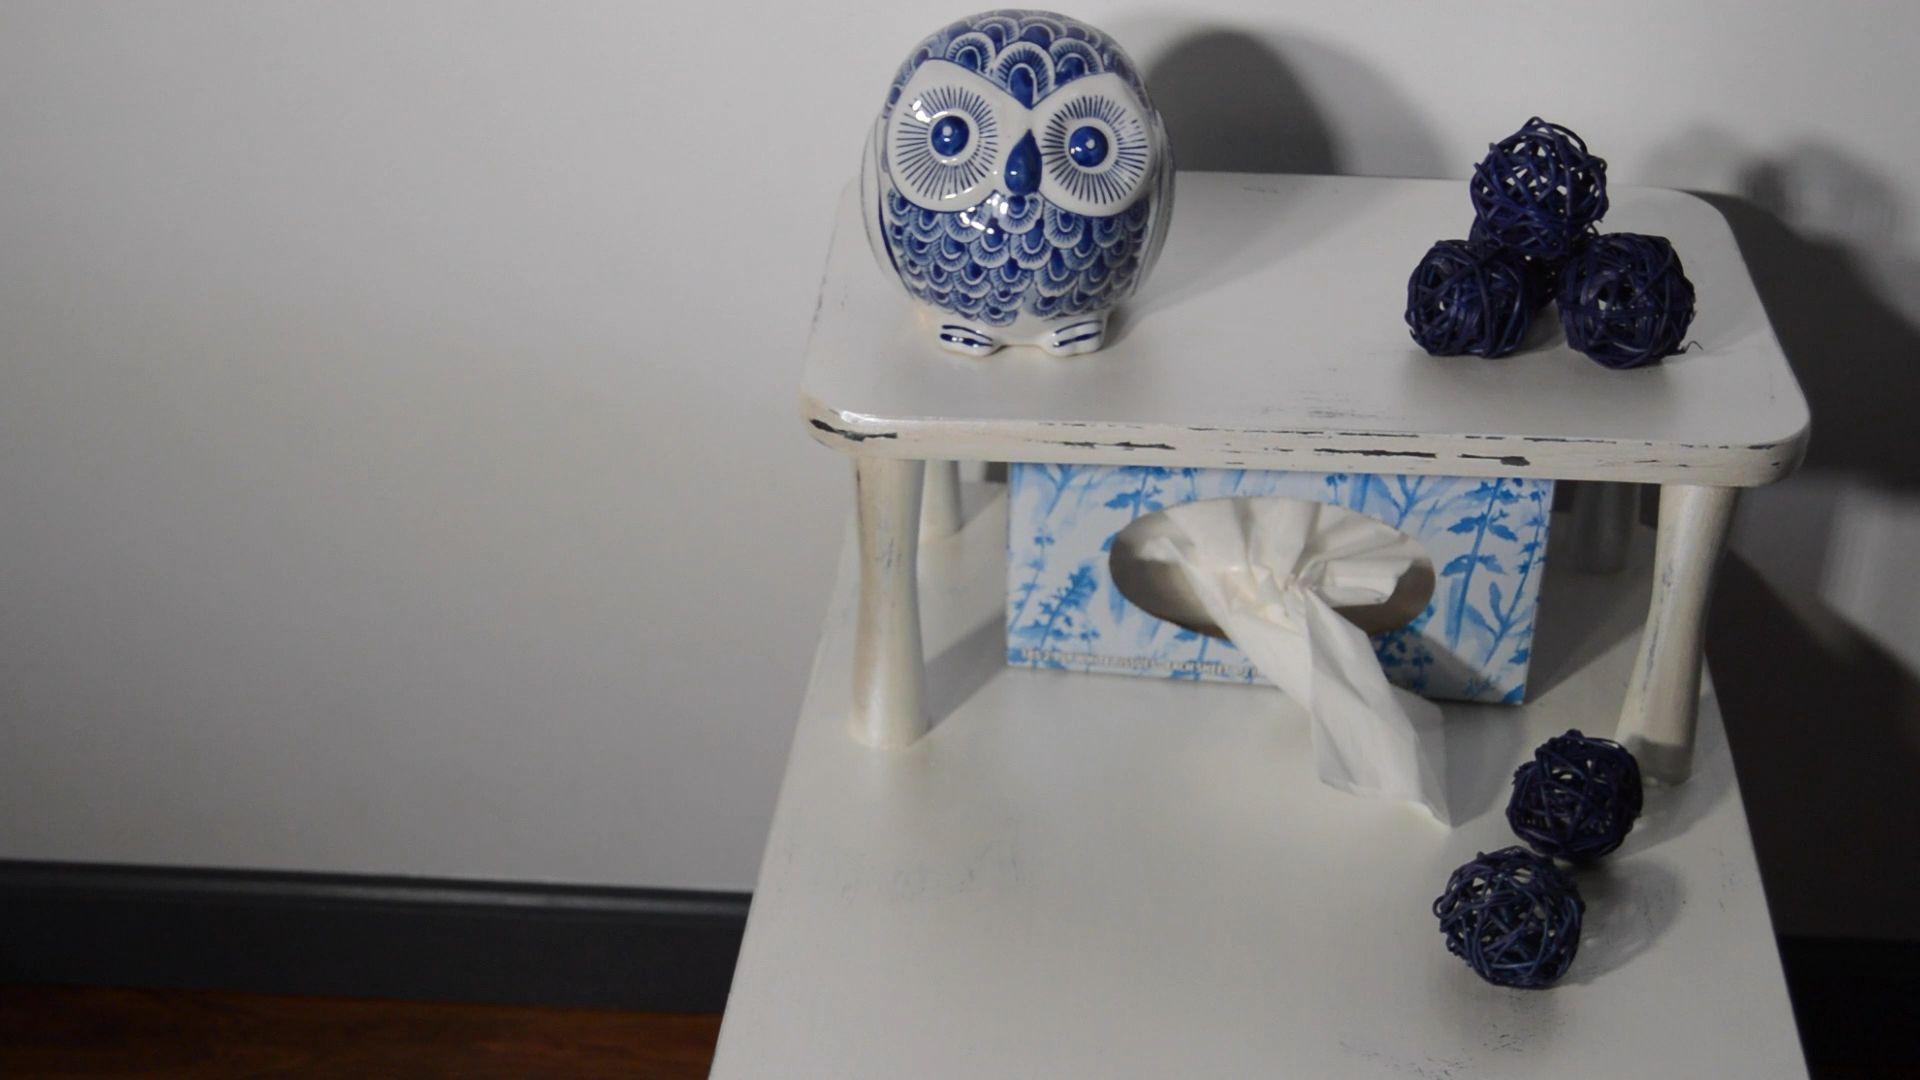 #bluedecor #decoration #decoratingideas #furnitureflip #furnitureflipping #metallic #metallicpaintedfurniture #creativity #table #tablefurniture #makeoverideas #diy